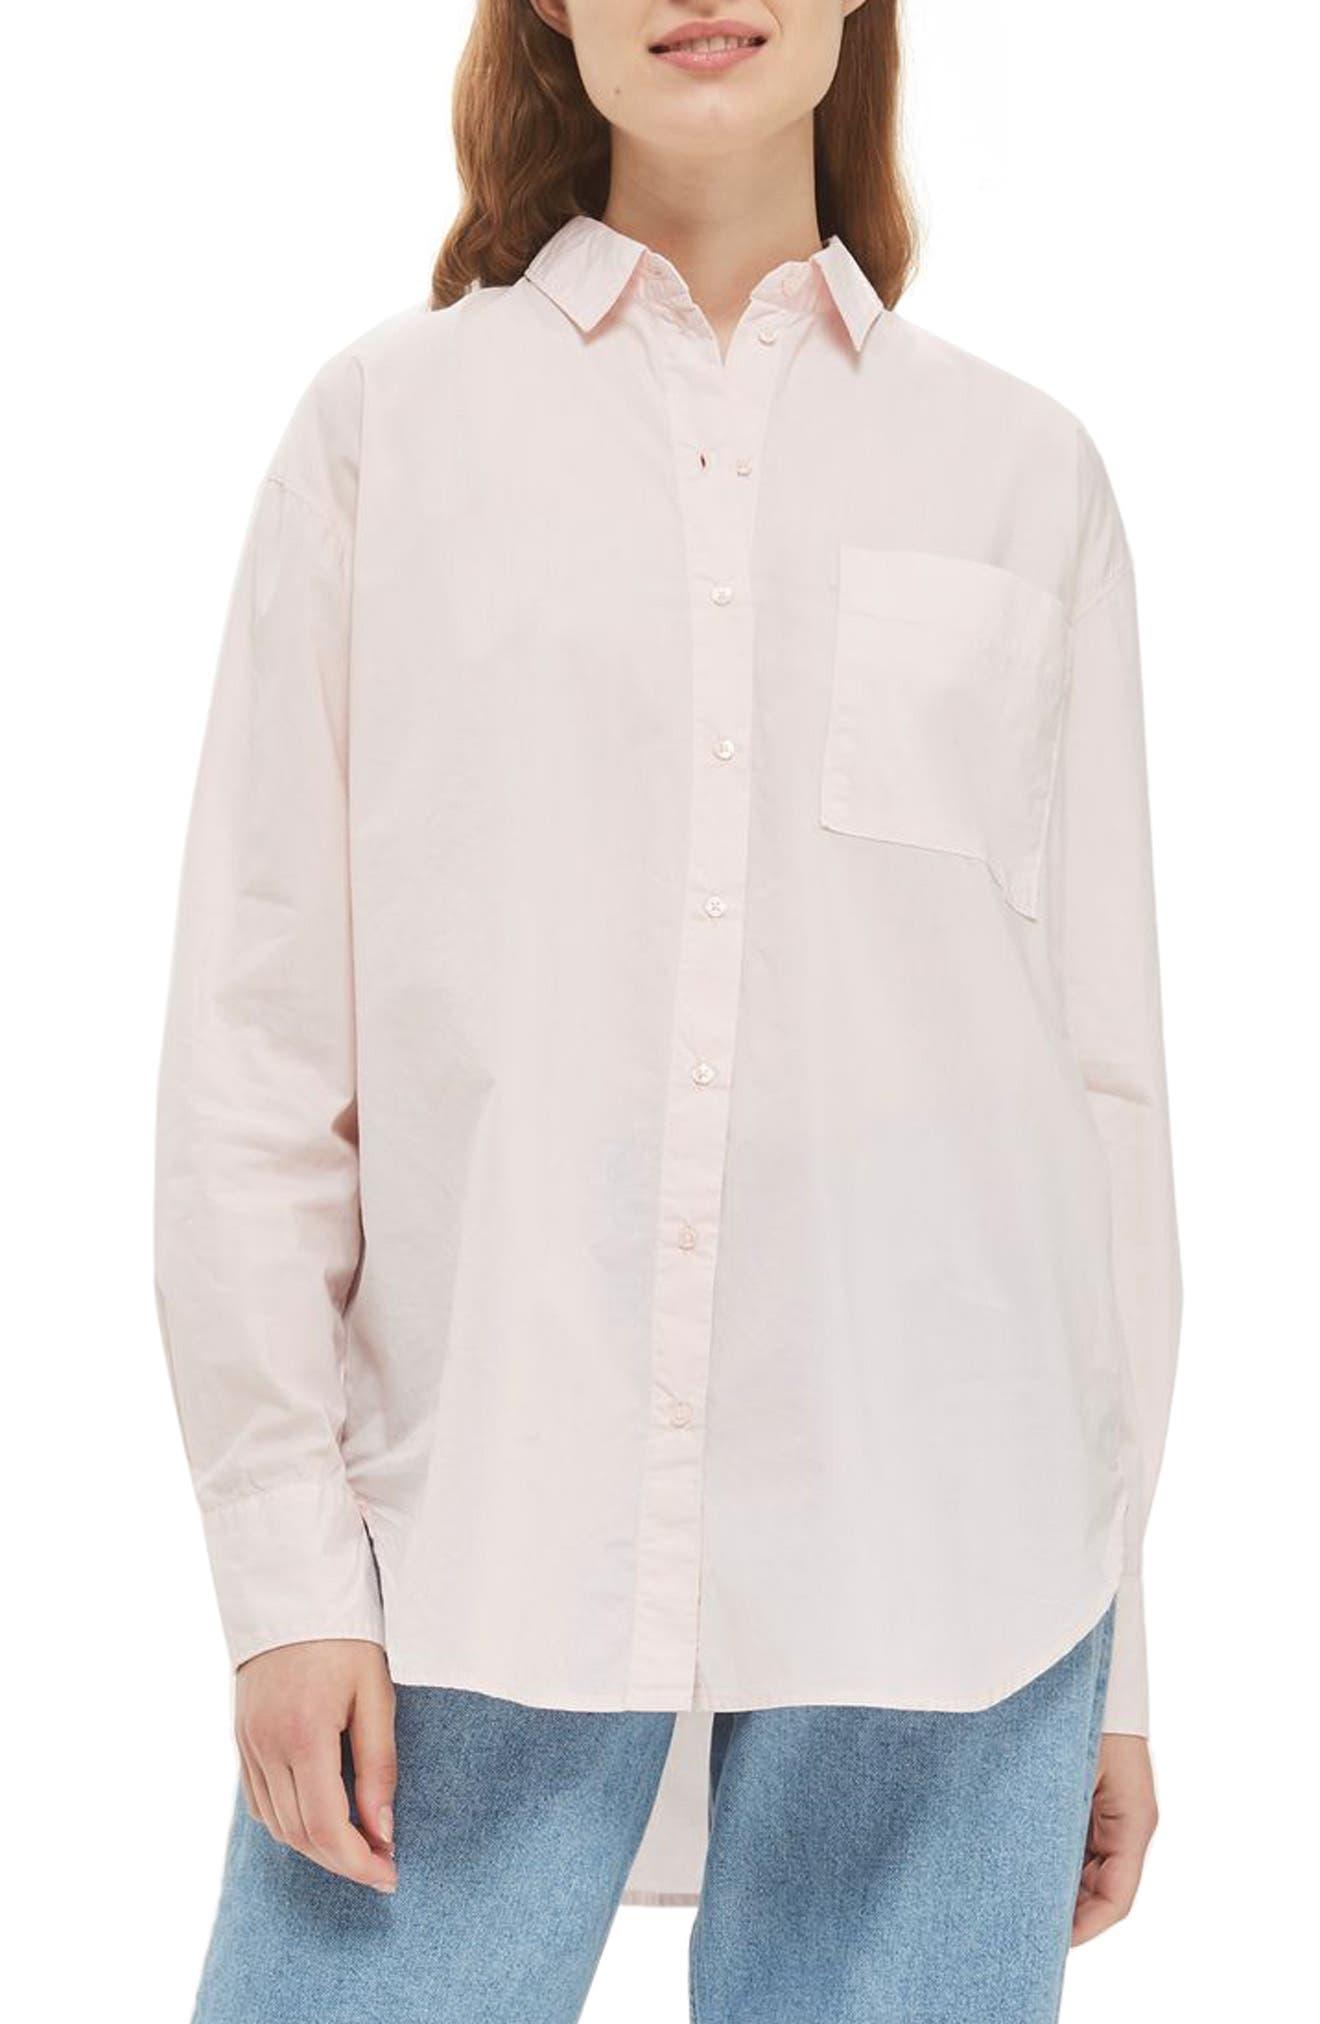 TOPSHOP, Olly Oversize Poplin Shirt, Main thumbnail 1, color, 680